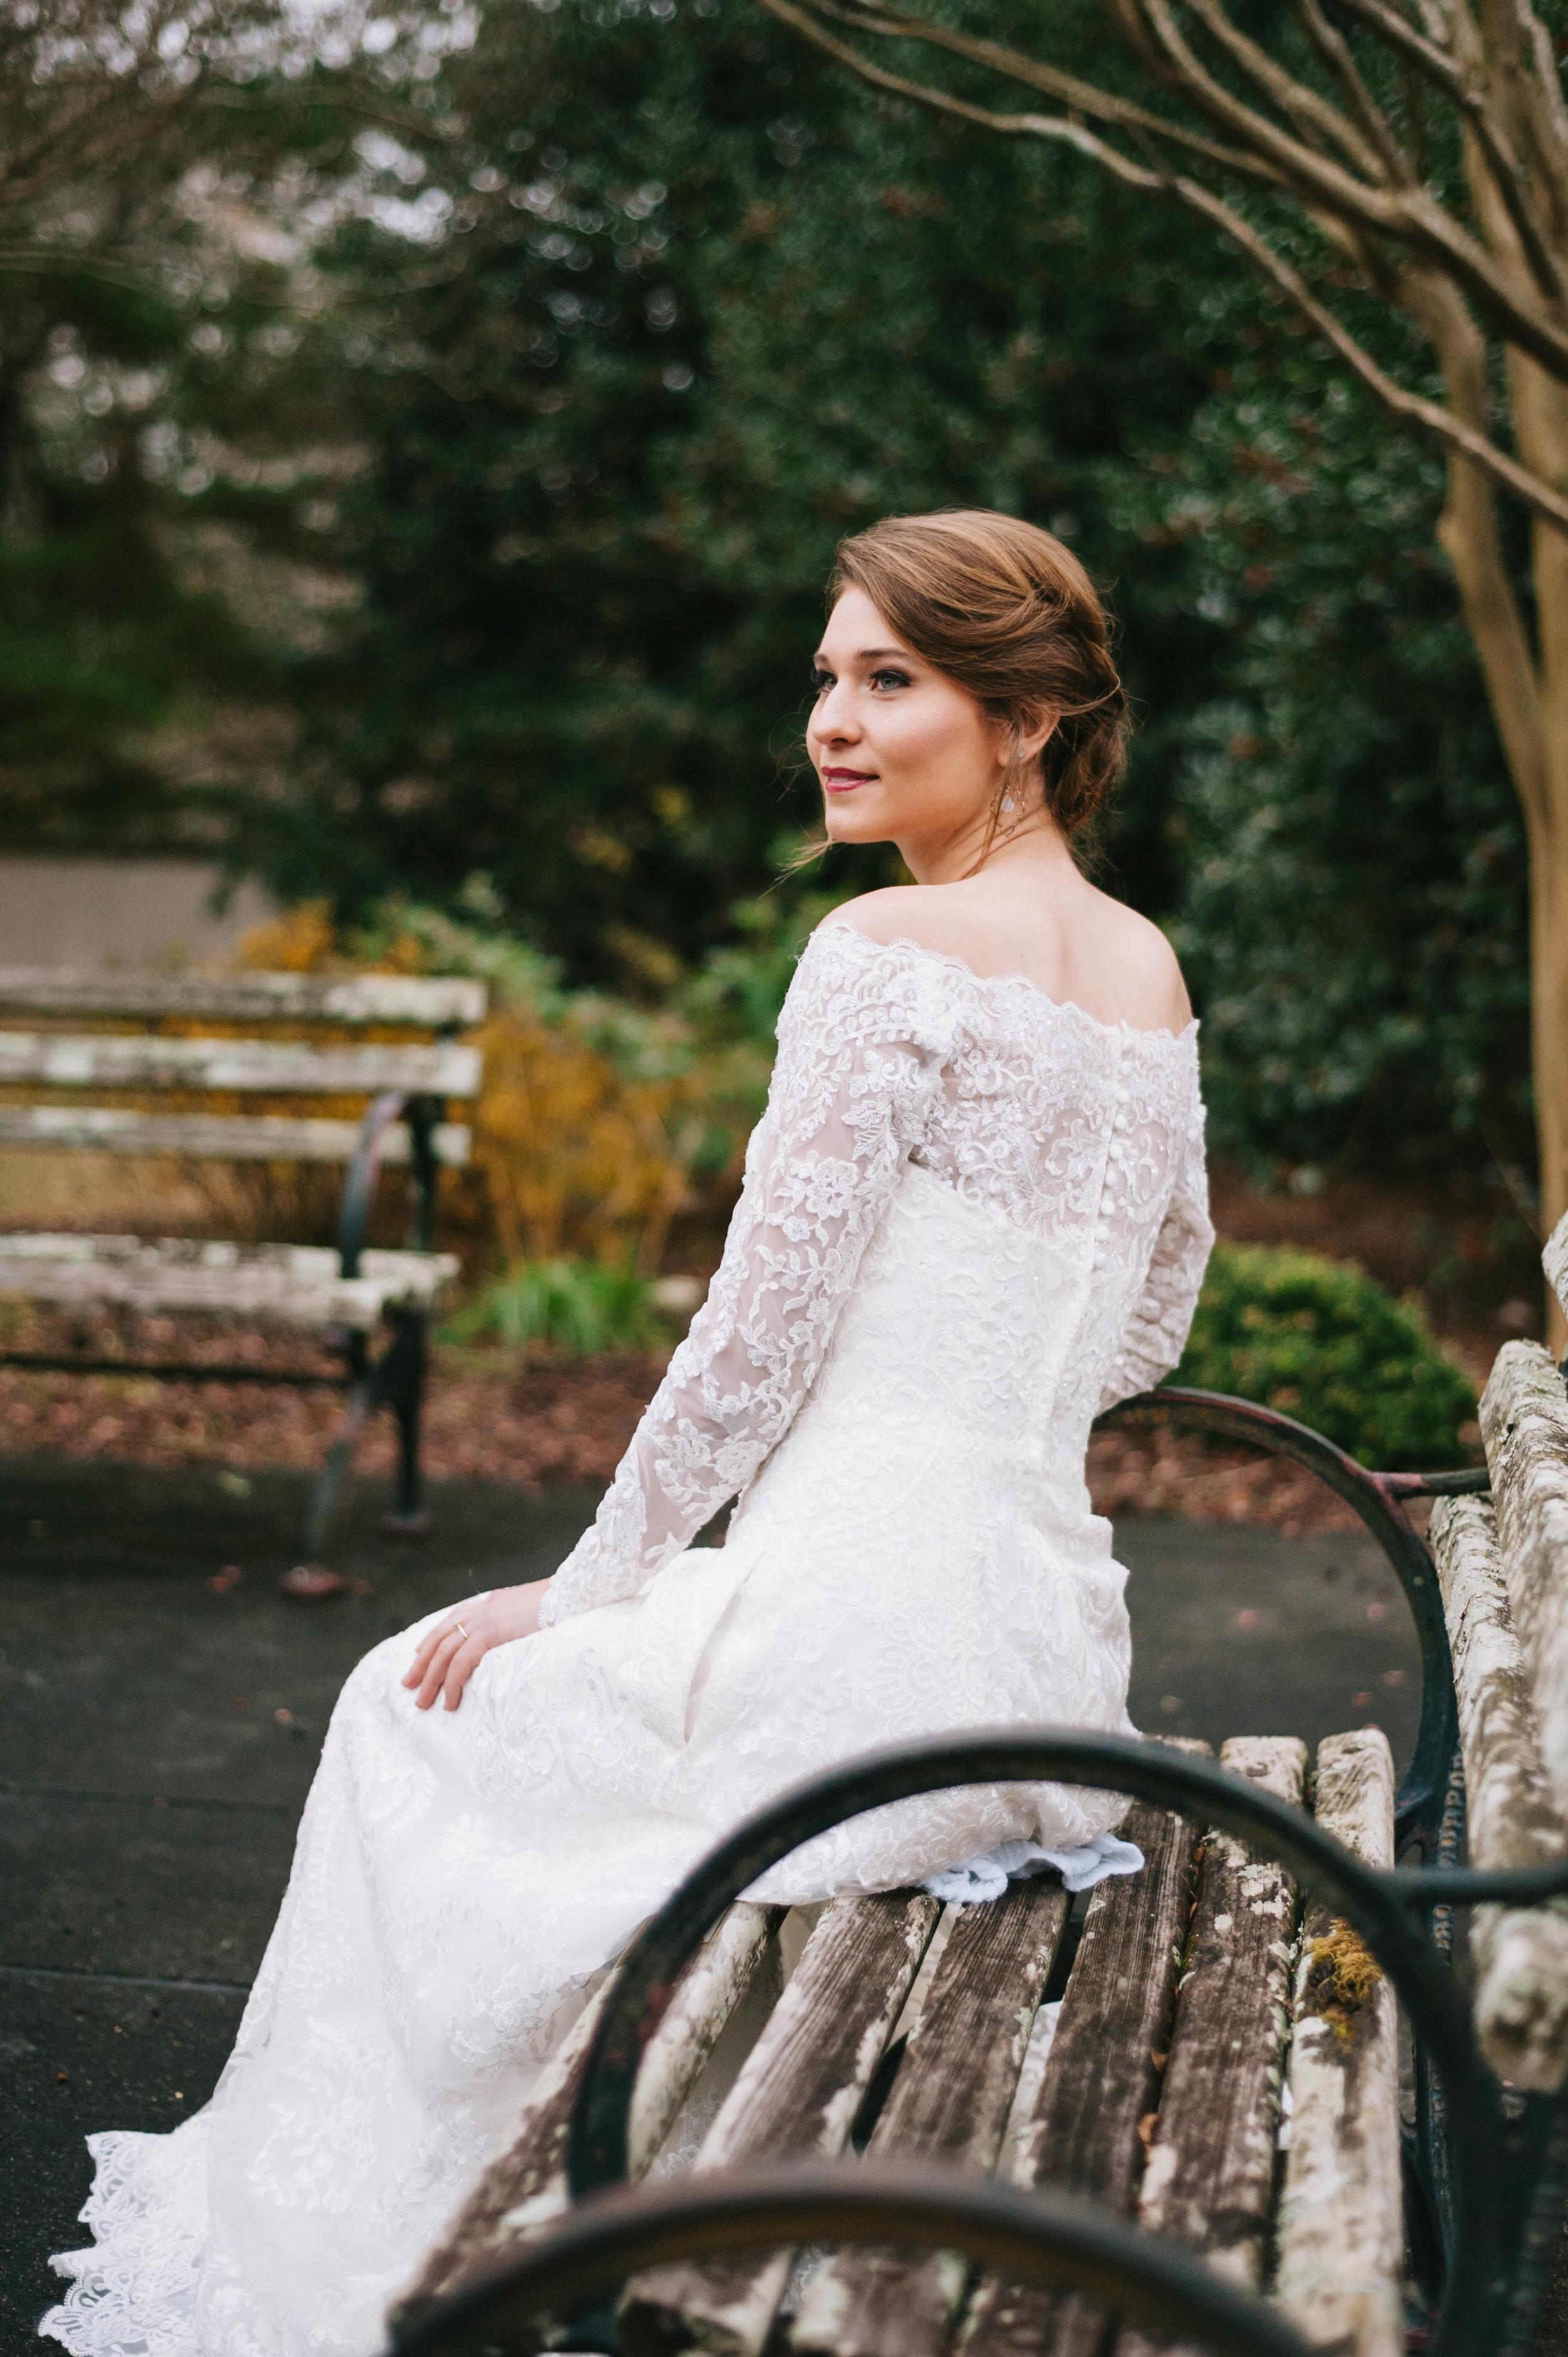 Hannah Steward Baskin | Bridals (41 of 74).jpg